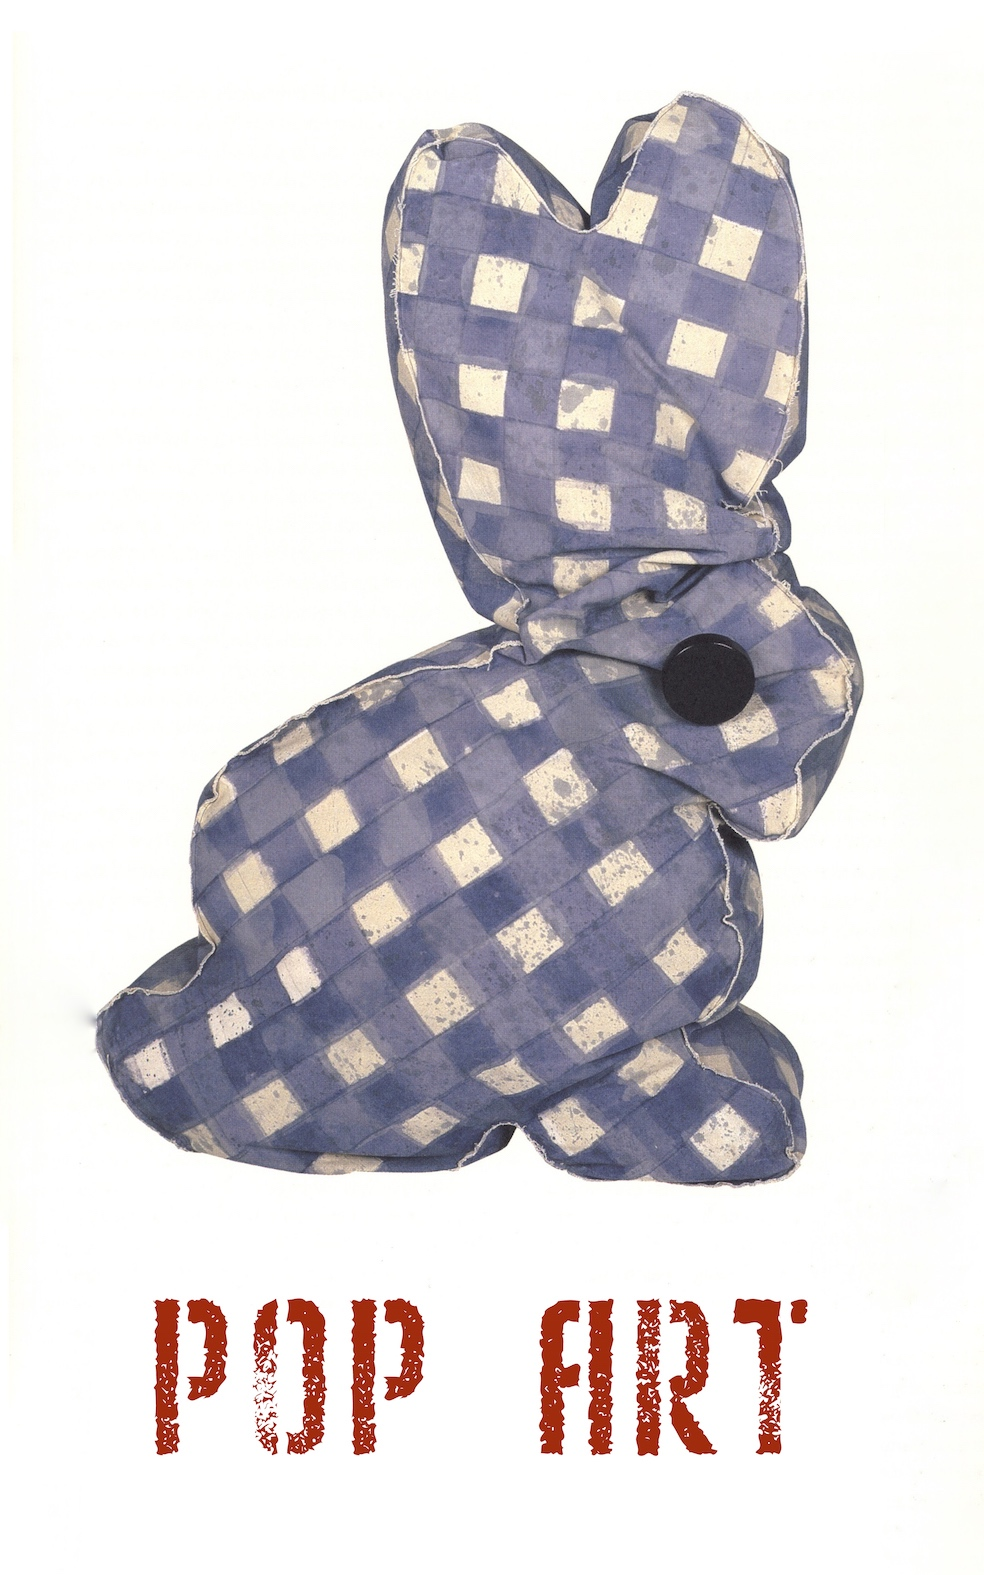 Claes Oldenburg, Calico Bunny 1987